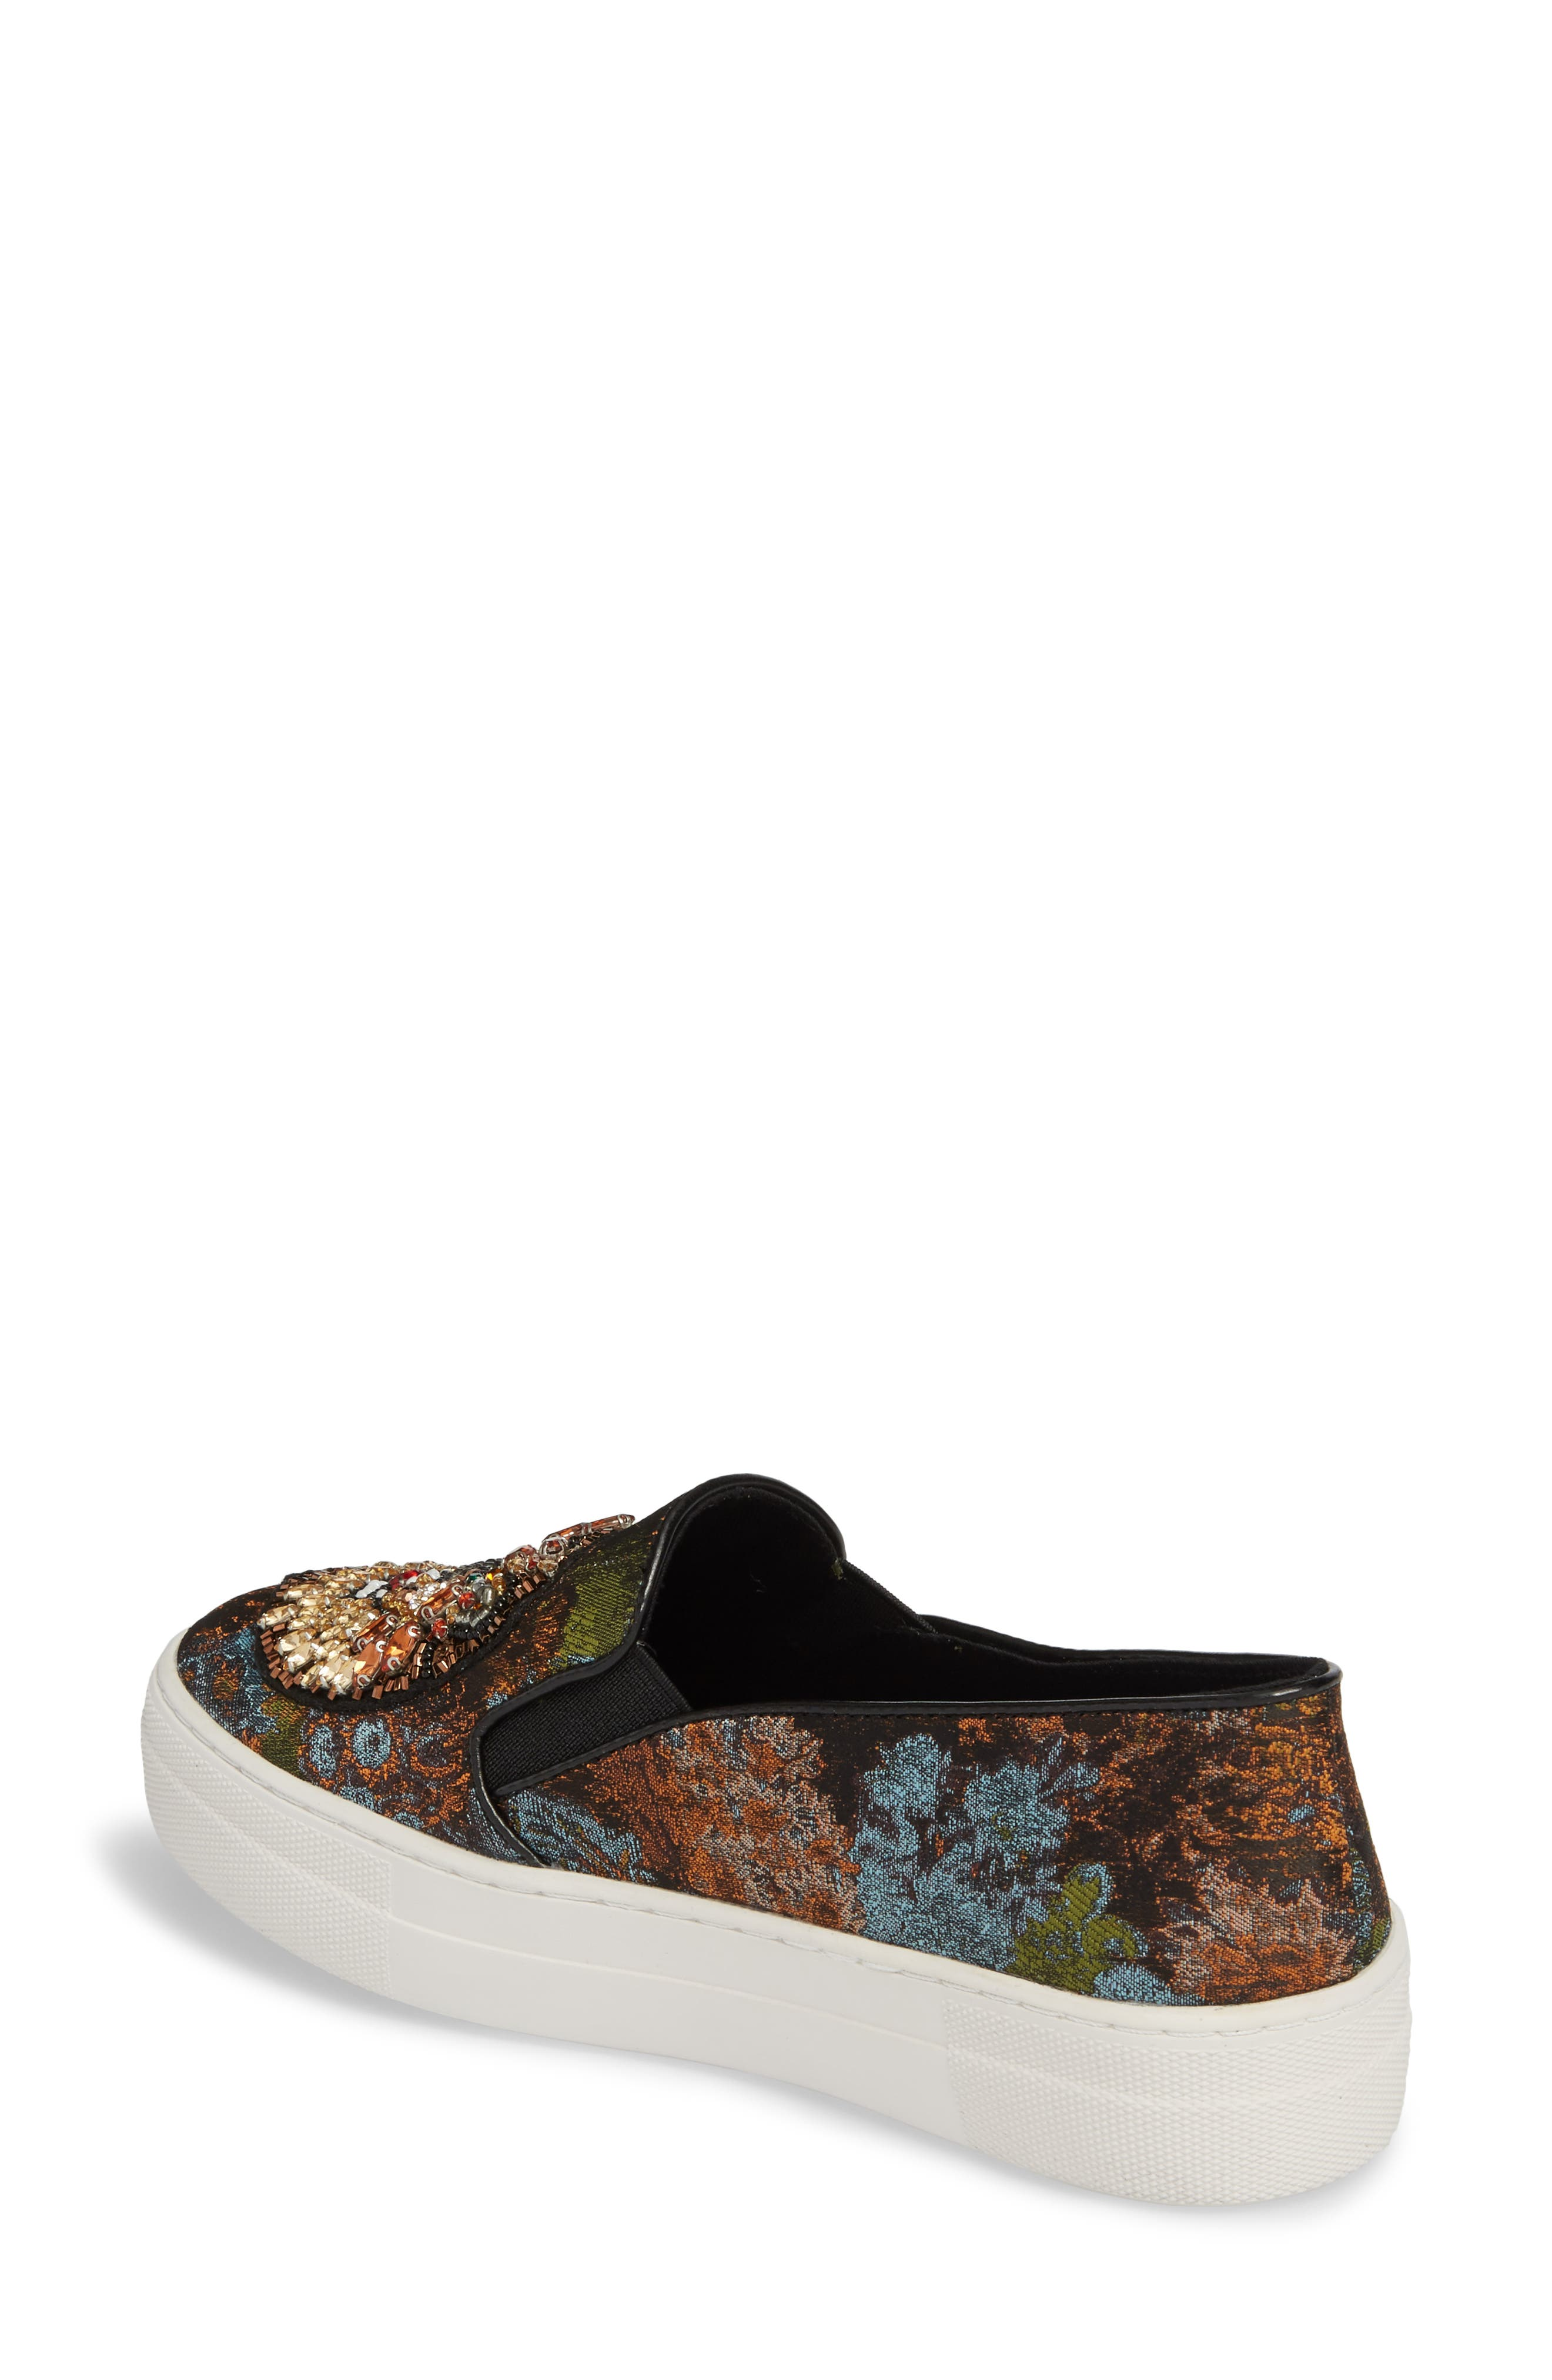 Fiasco Platform Sneaker,                             Alternate thumbnail 2, color,                             Black Multi